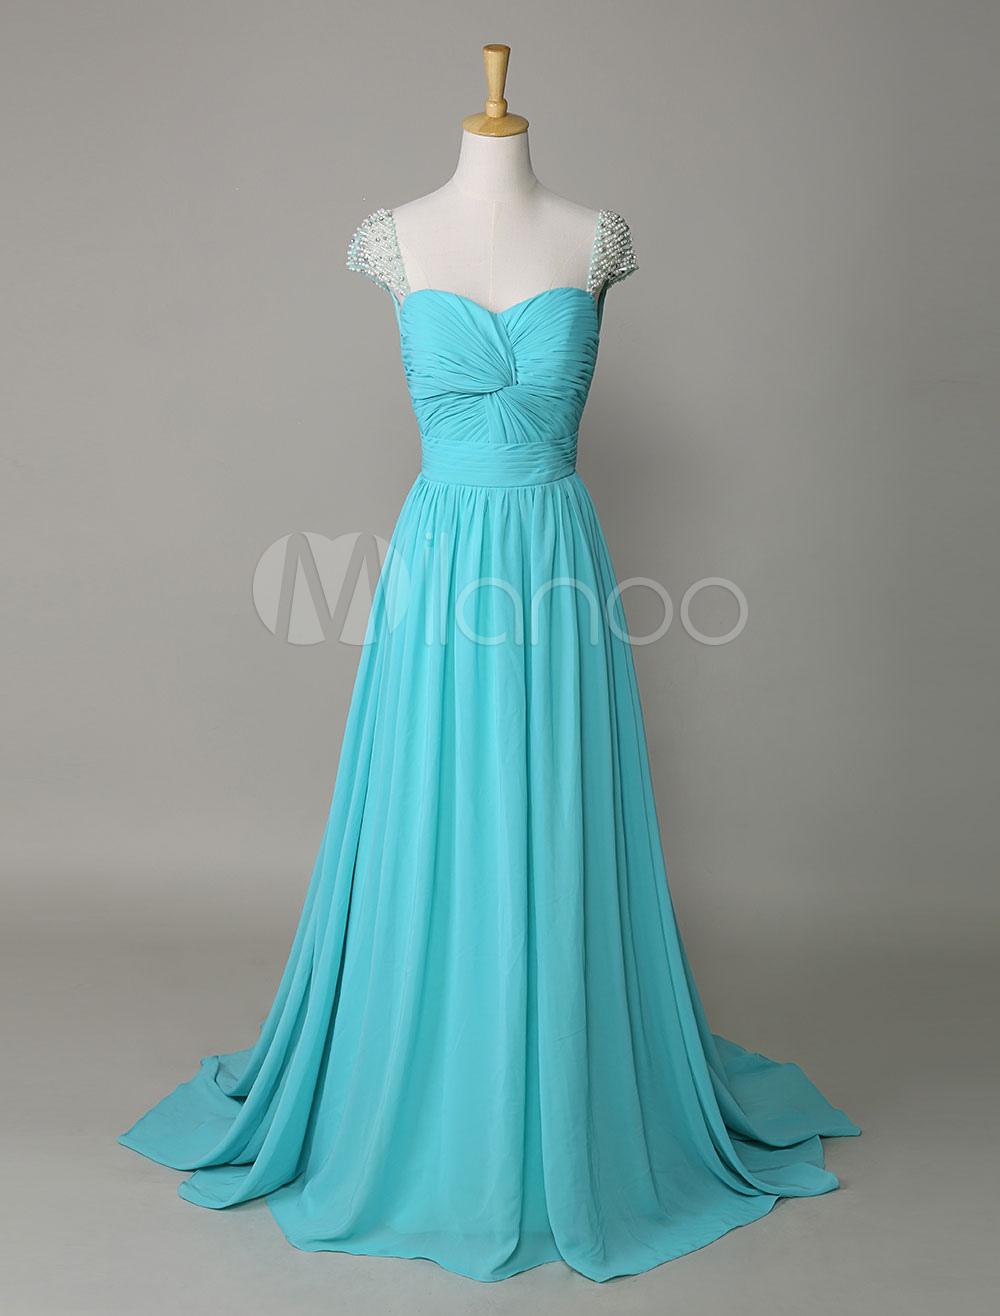 Beaded Cap Sleeve Twisted Bodice Long Prom Dress (Wedding Prom Dresses) photo